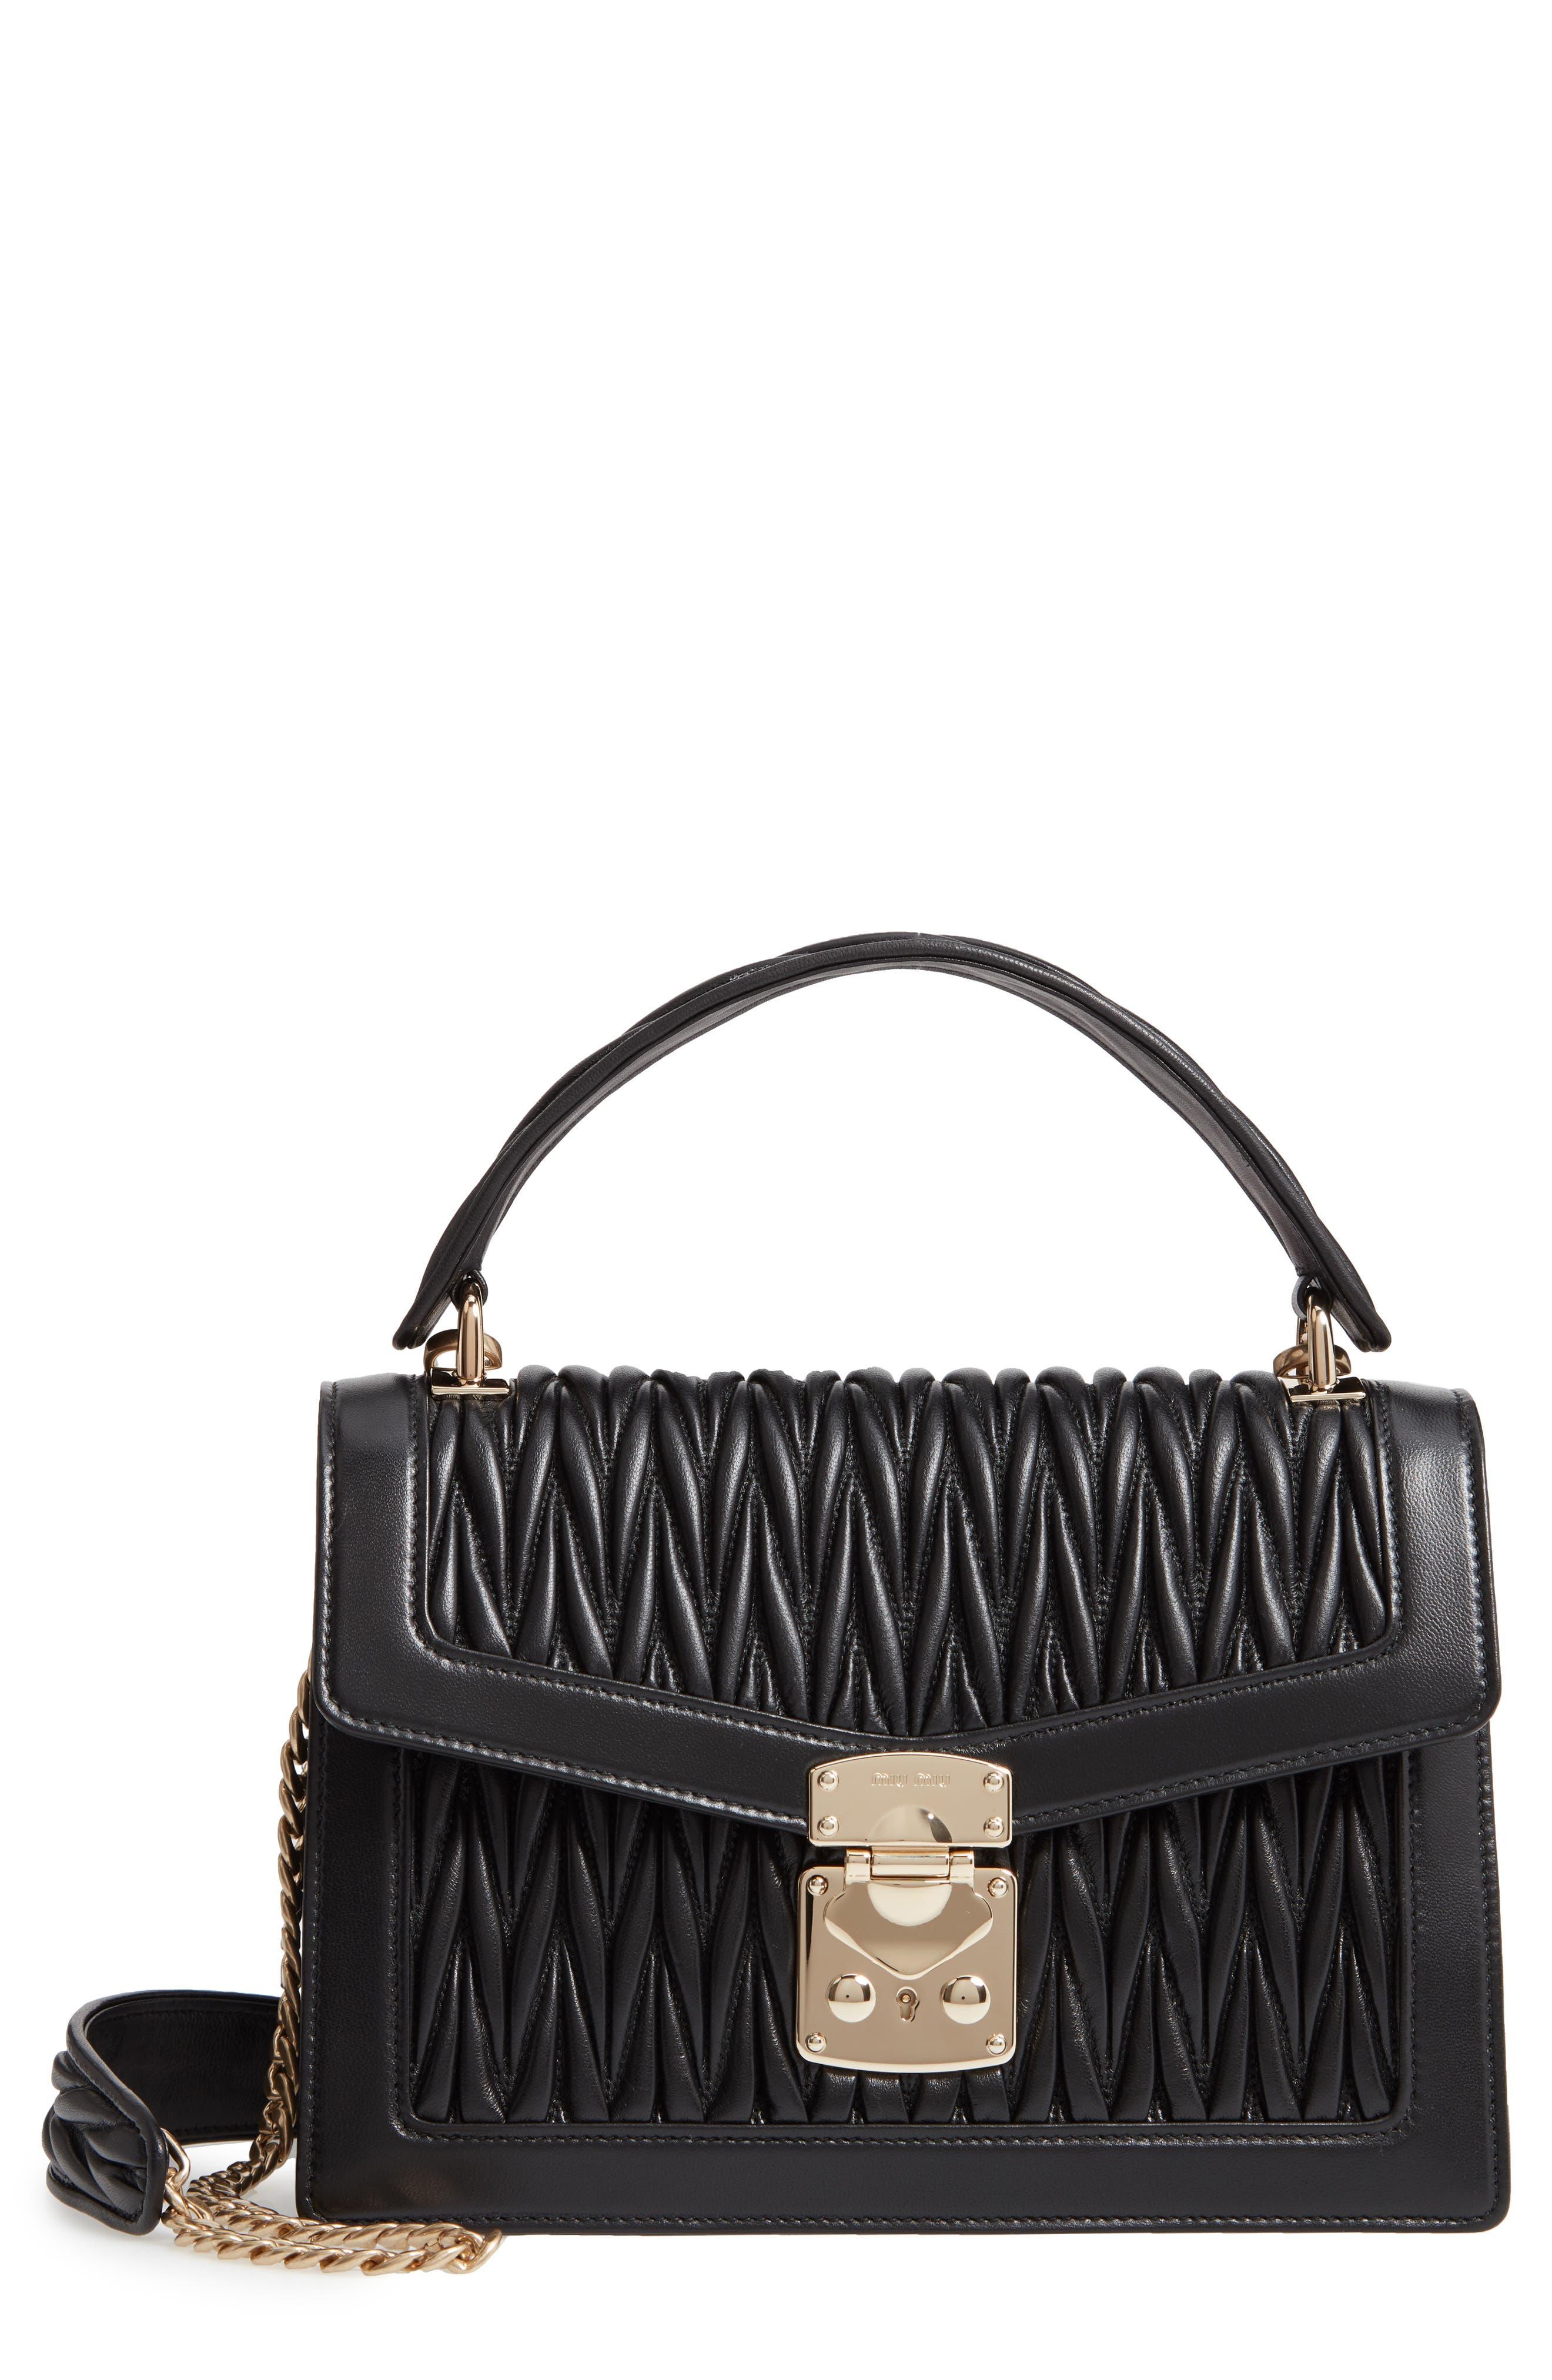 Confidential Matelassé Quilted Lambskin Leather Top Handle Bag,                             Main thumbnail 1, color,                             NERO